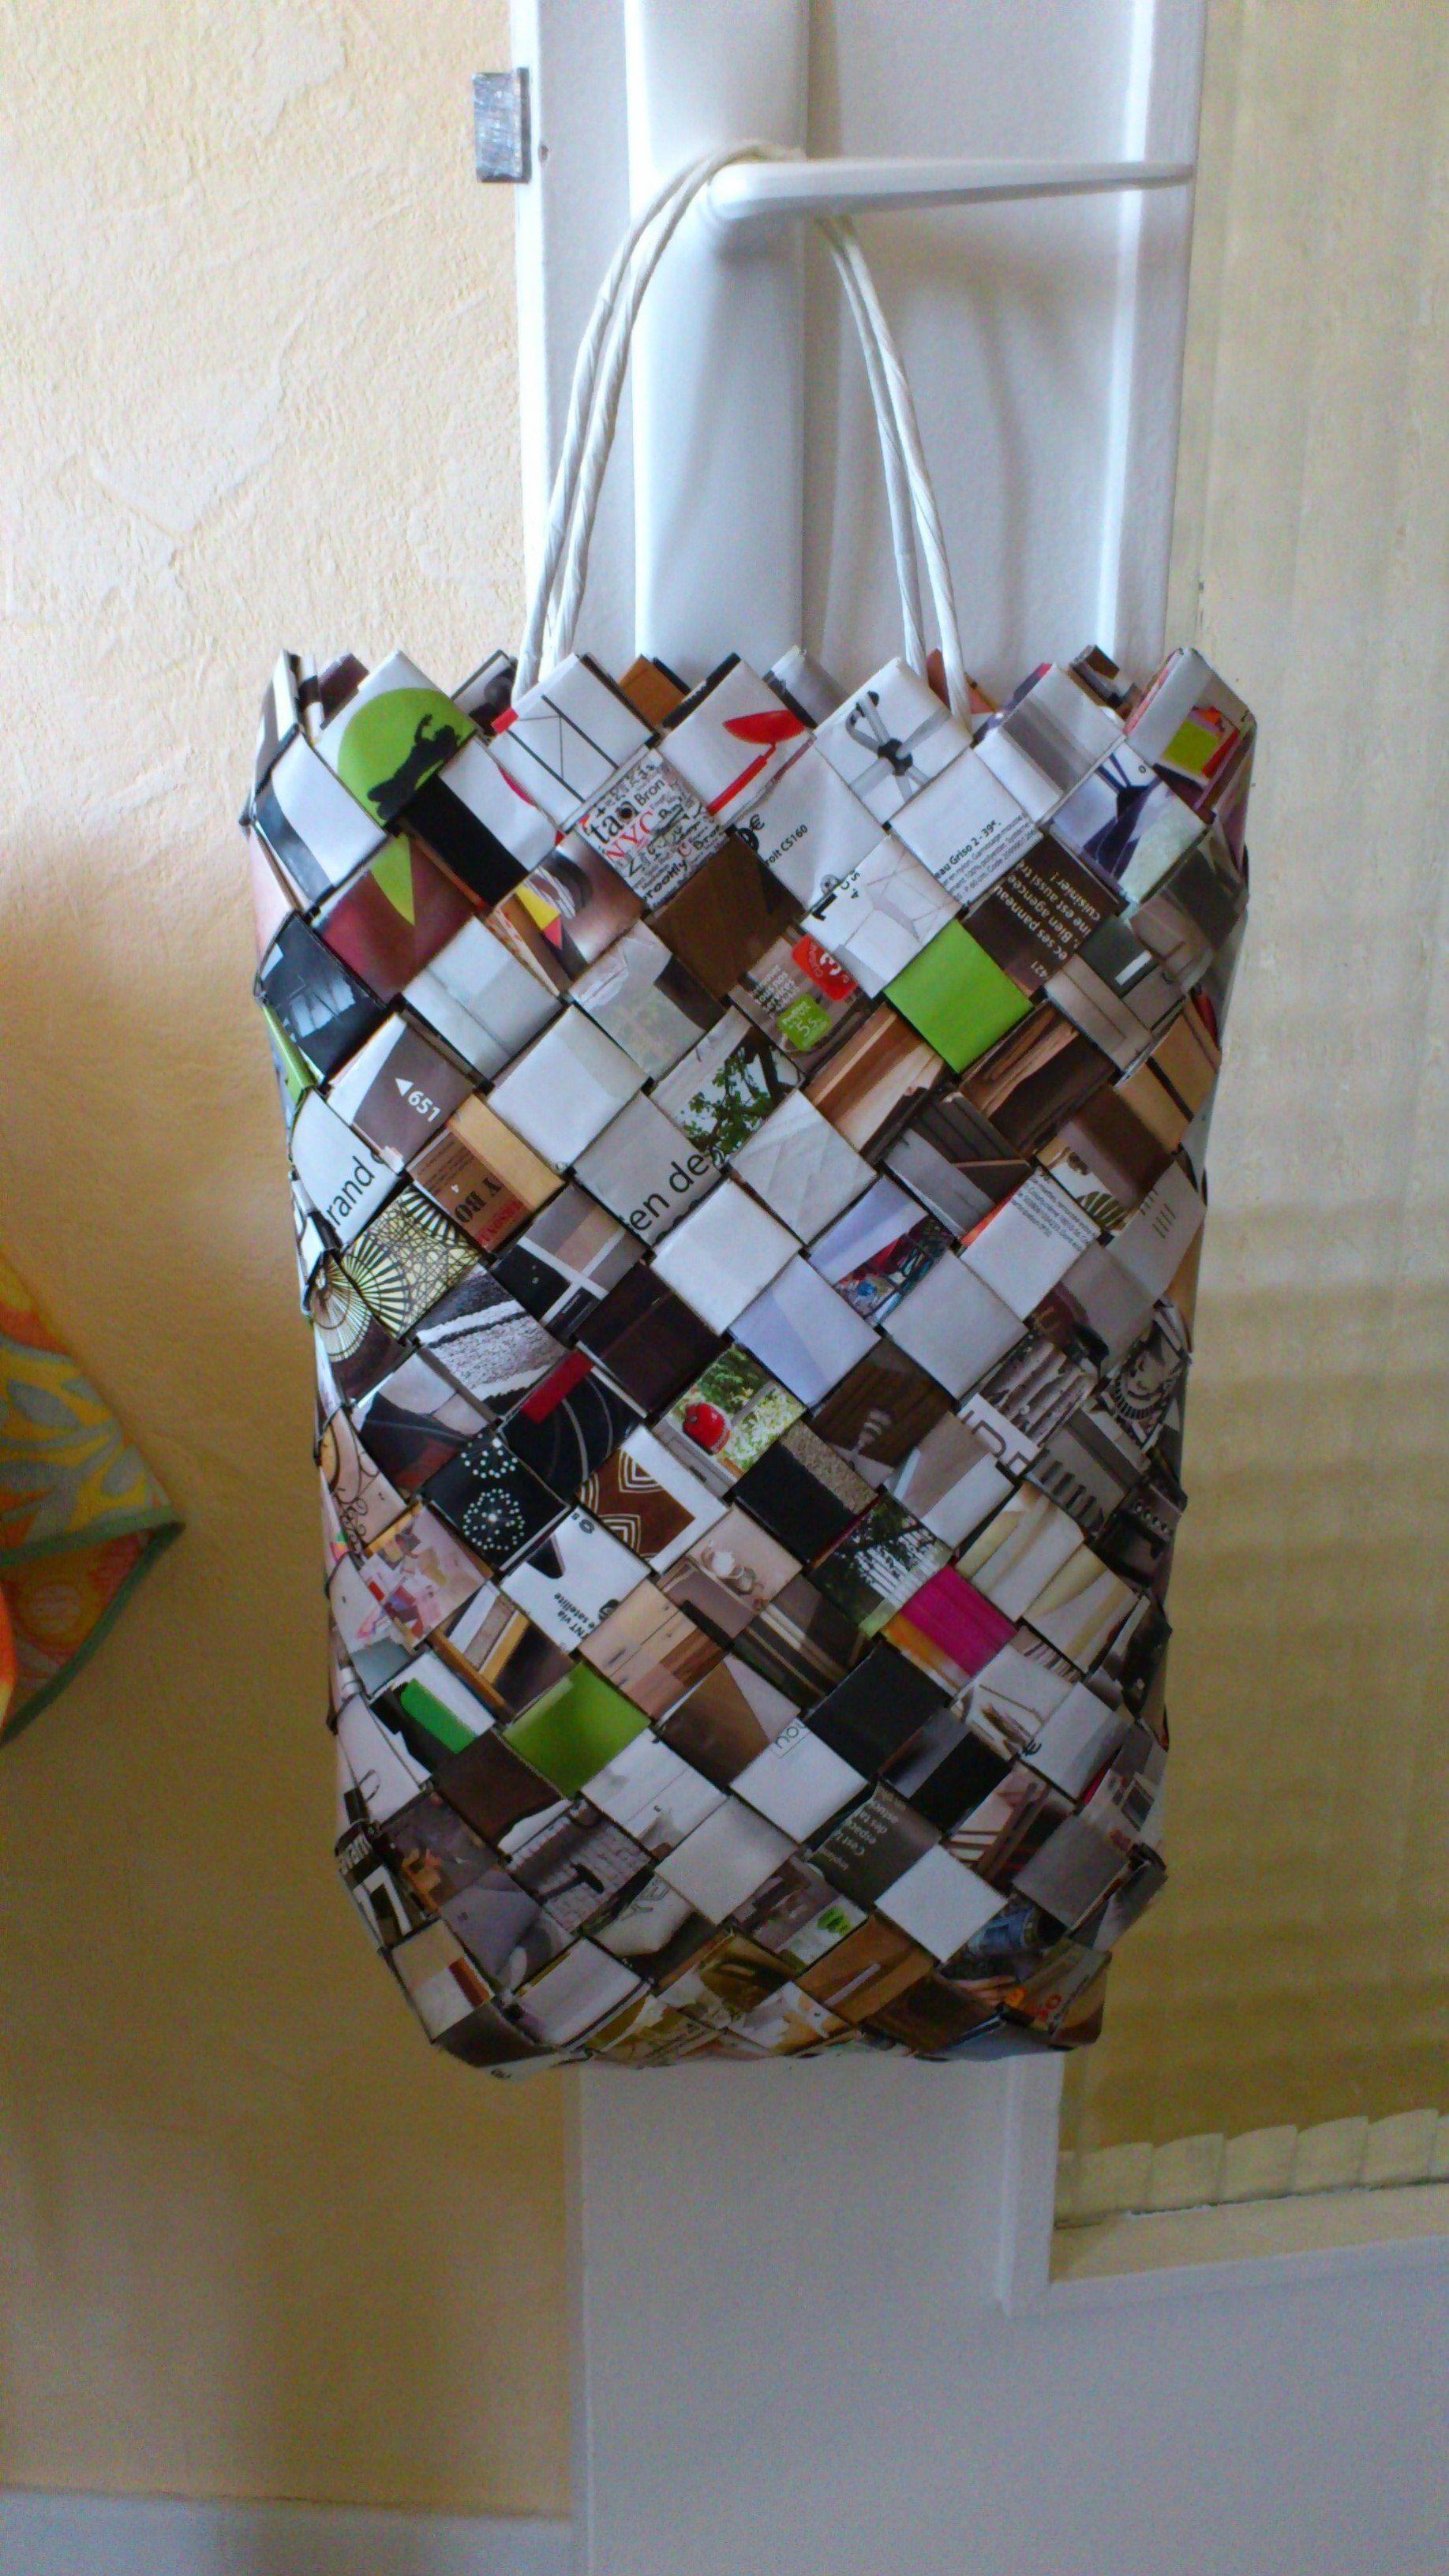 sac tress en papier dipl me pinterest tresser sac et sac papier. Black Bedroom Furniture Sets. Home Design Ideas